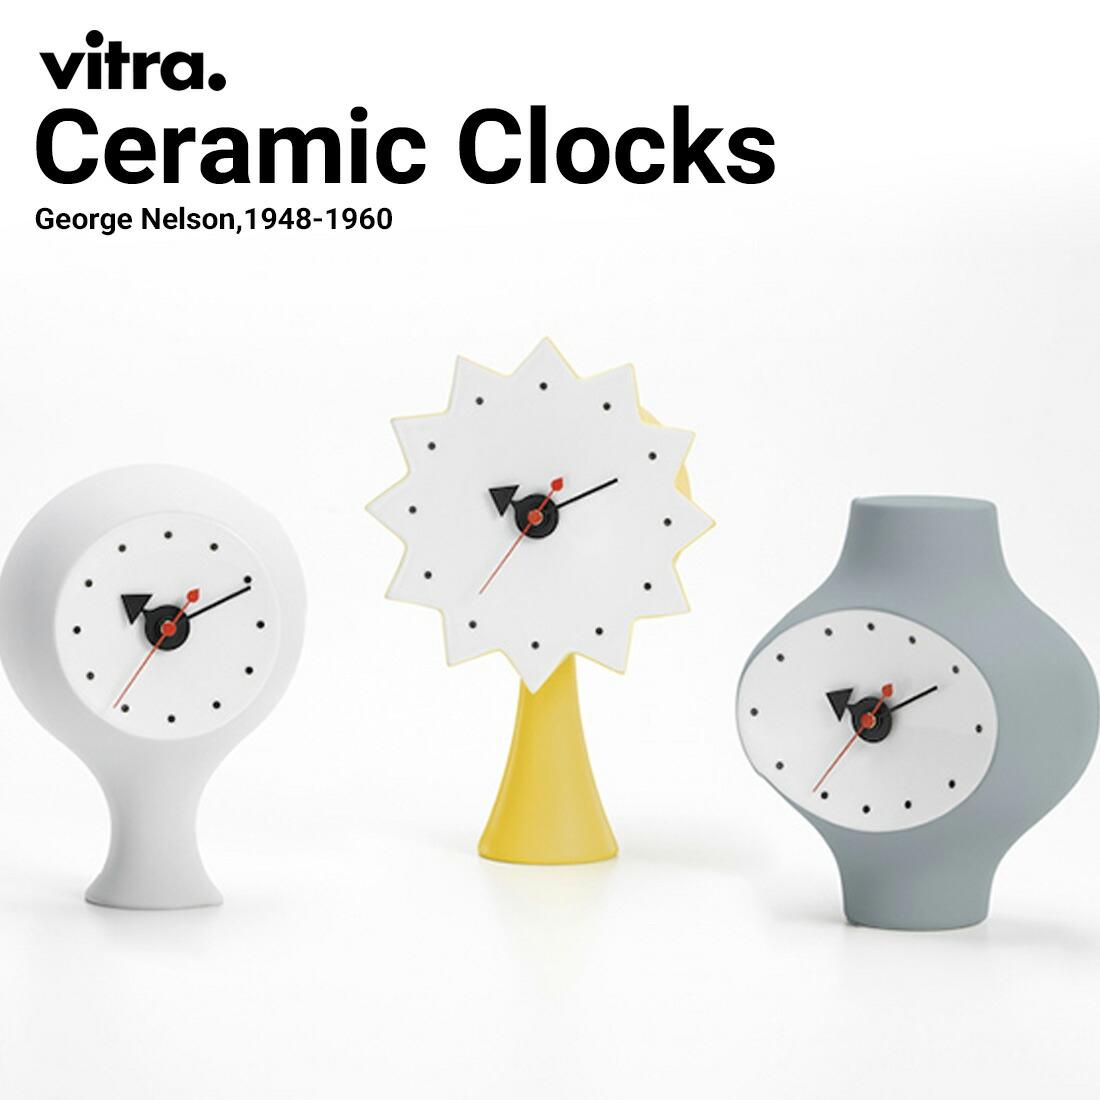 【Vitra】Ceramic Clocks セラミック クロッククロック 置き時計 George Nelson ジョージ・ネルソン ヴィトラ 陶器 コンビニ受取対応